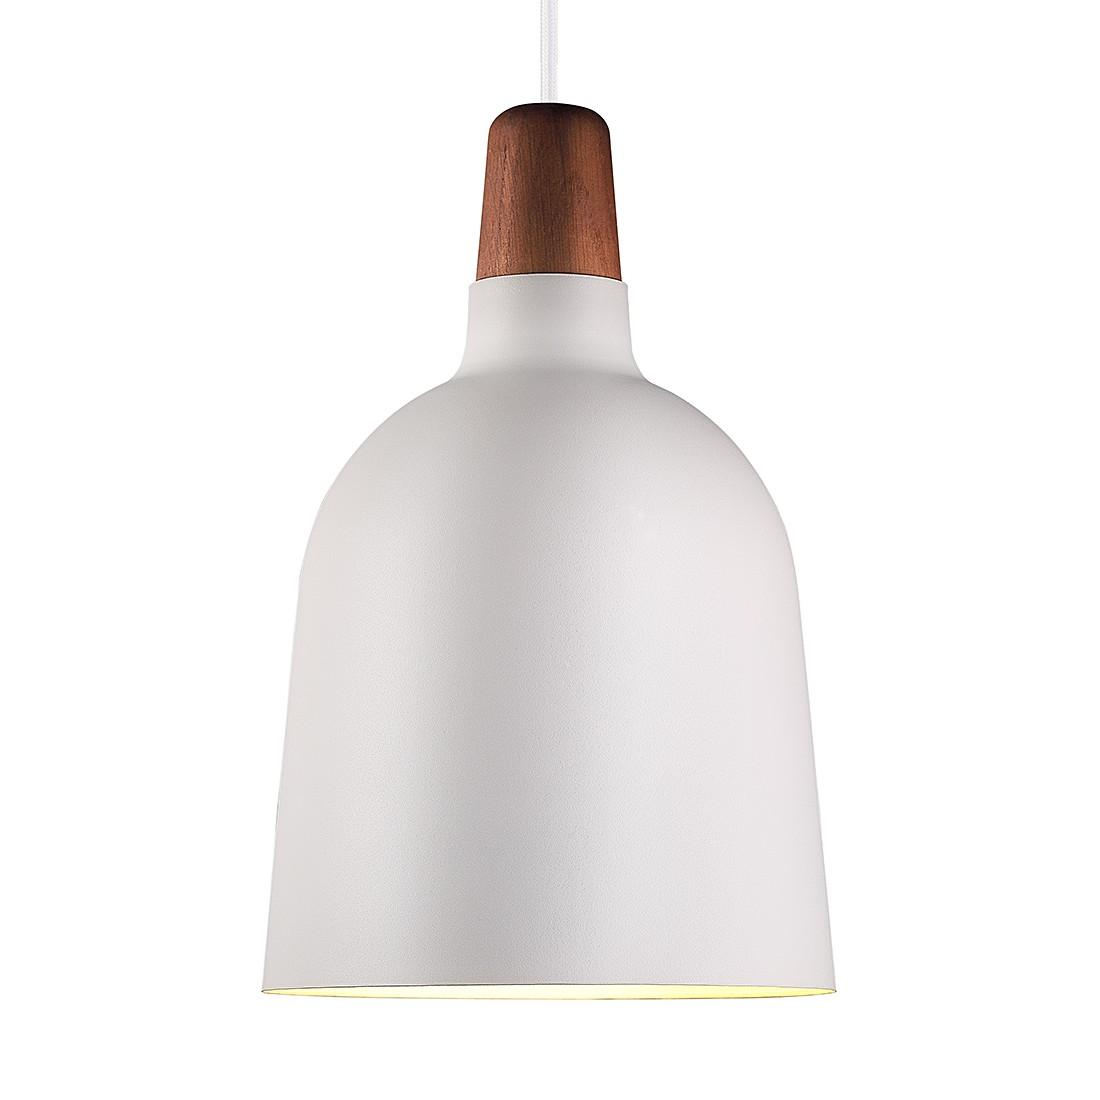 Pendelleuchte Karma 20 ● Metall ● Weiß ● 1-flammig- Nordlux A++